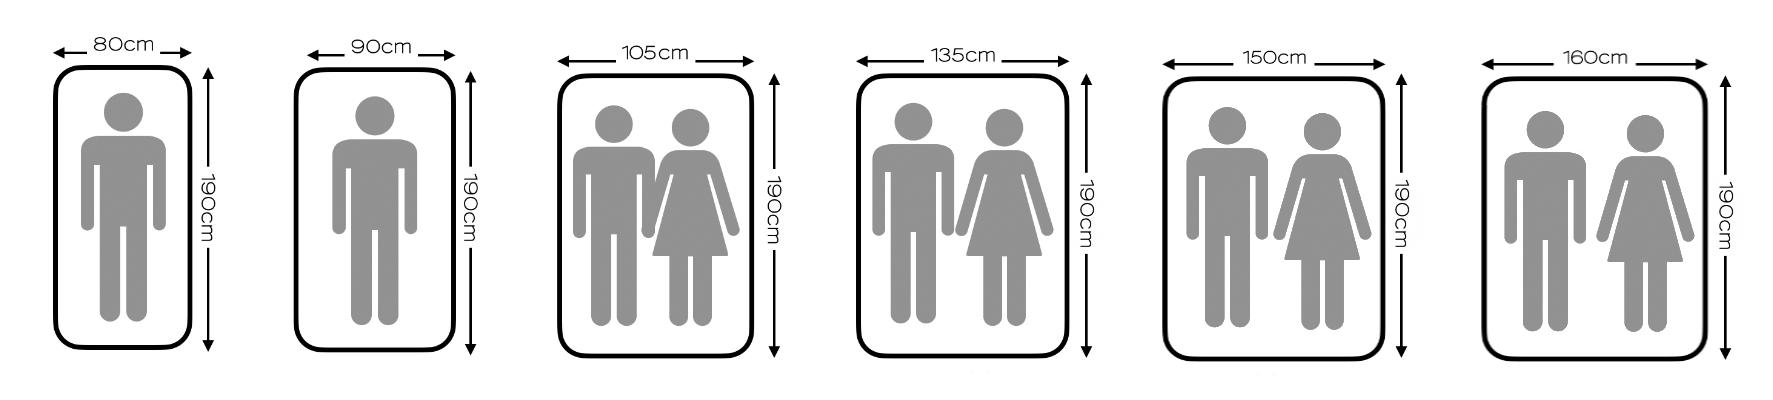 medidas somier dunlopillo_190cm